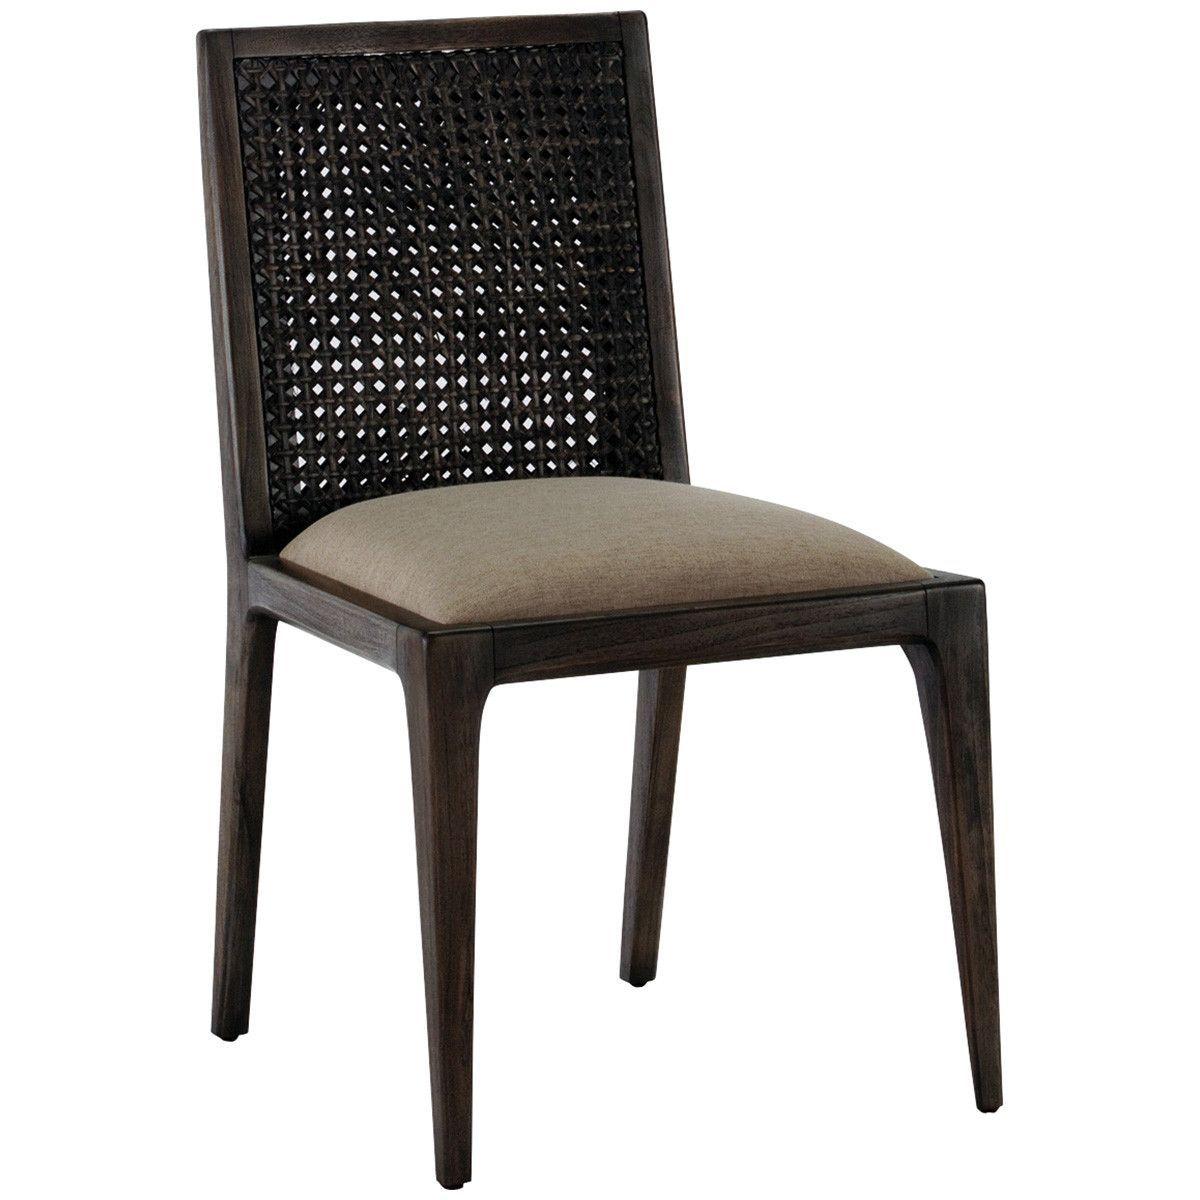 Brownstone Furniture Messina Rattan Dining Chair Rattan Dining Chairs Dining Chairs Side Chairs [ 1200 x 1200 Pixel ]